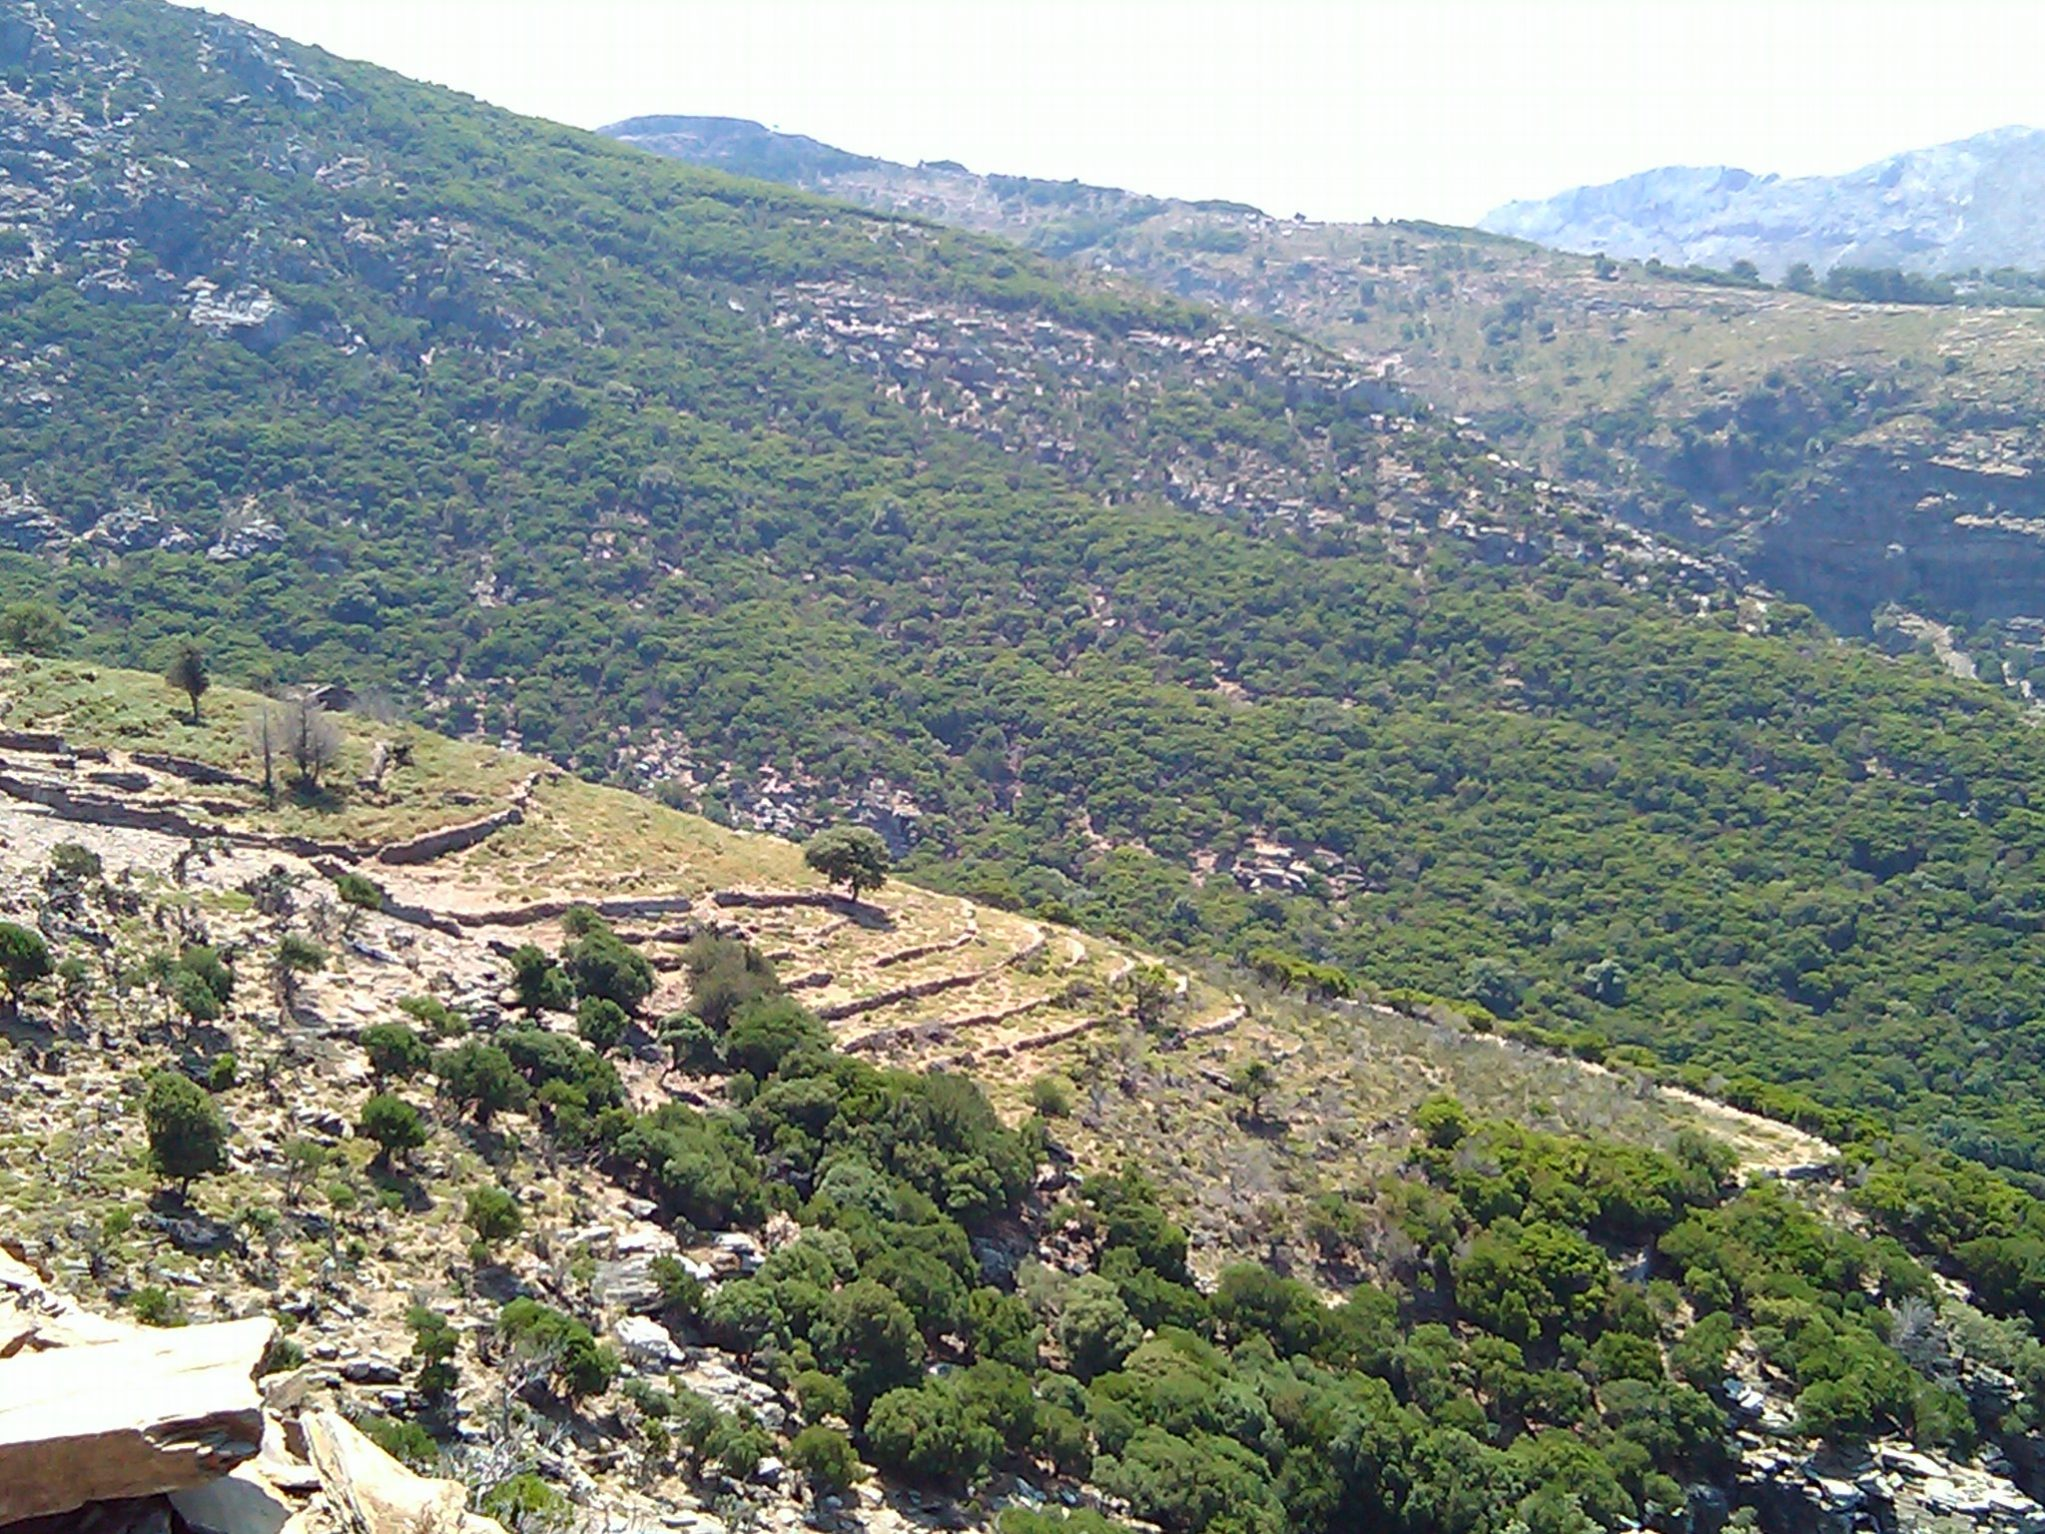 Hiking Ikaria: Doutsoula – Arehtousa   Περπατώντας στην Ικαρία: Δρούτσουλα – Αρέθουσα